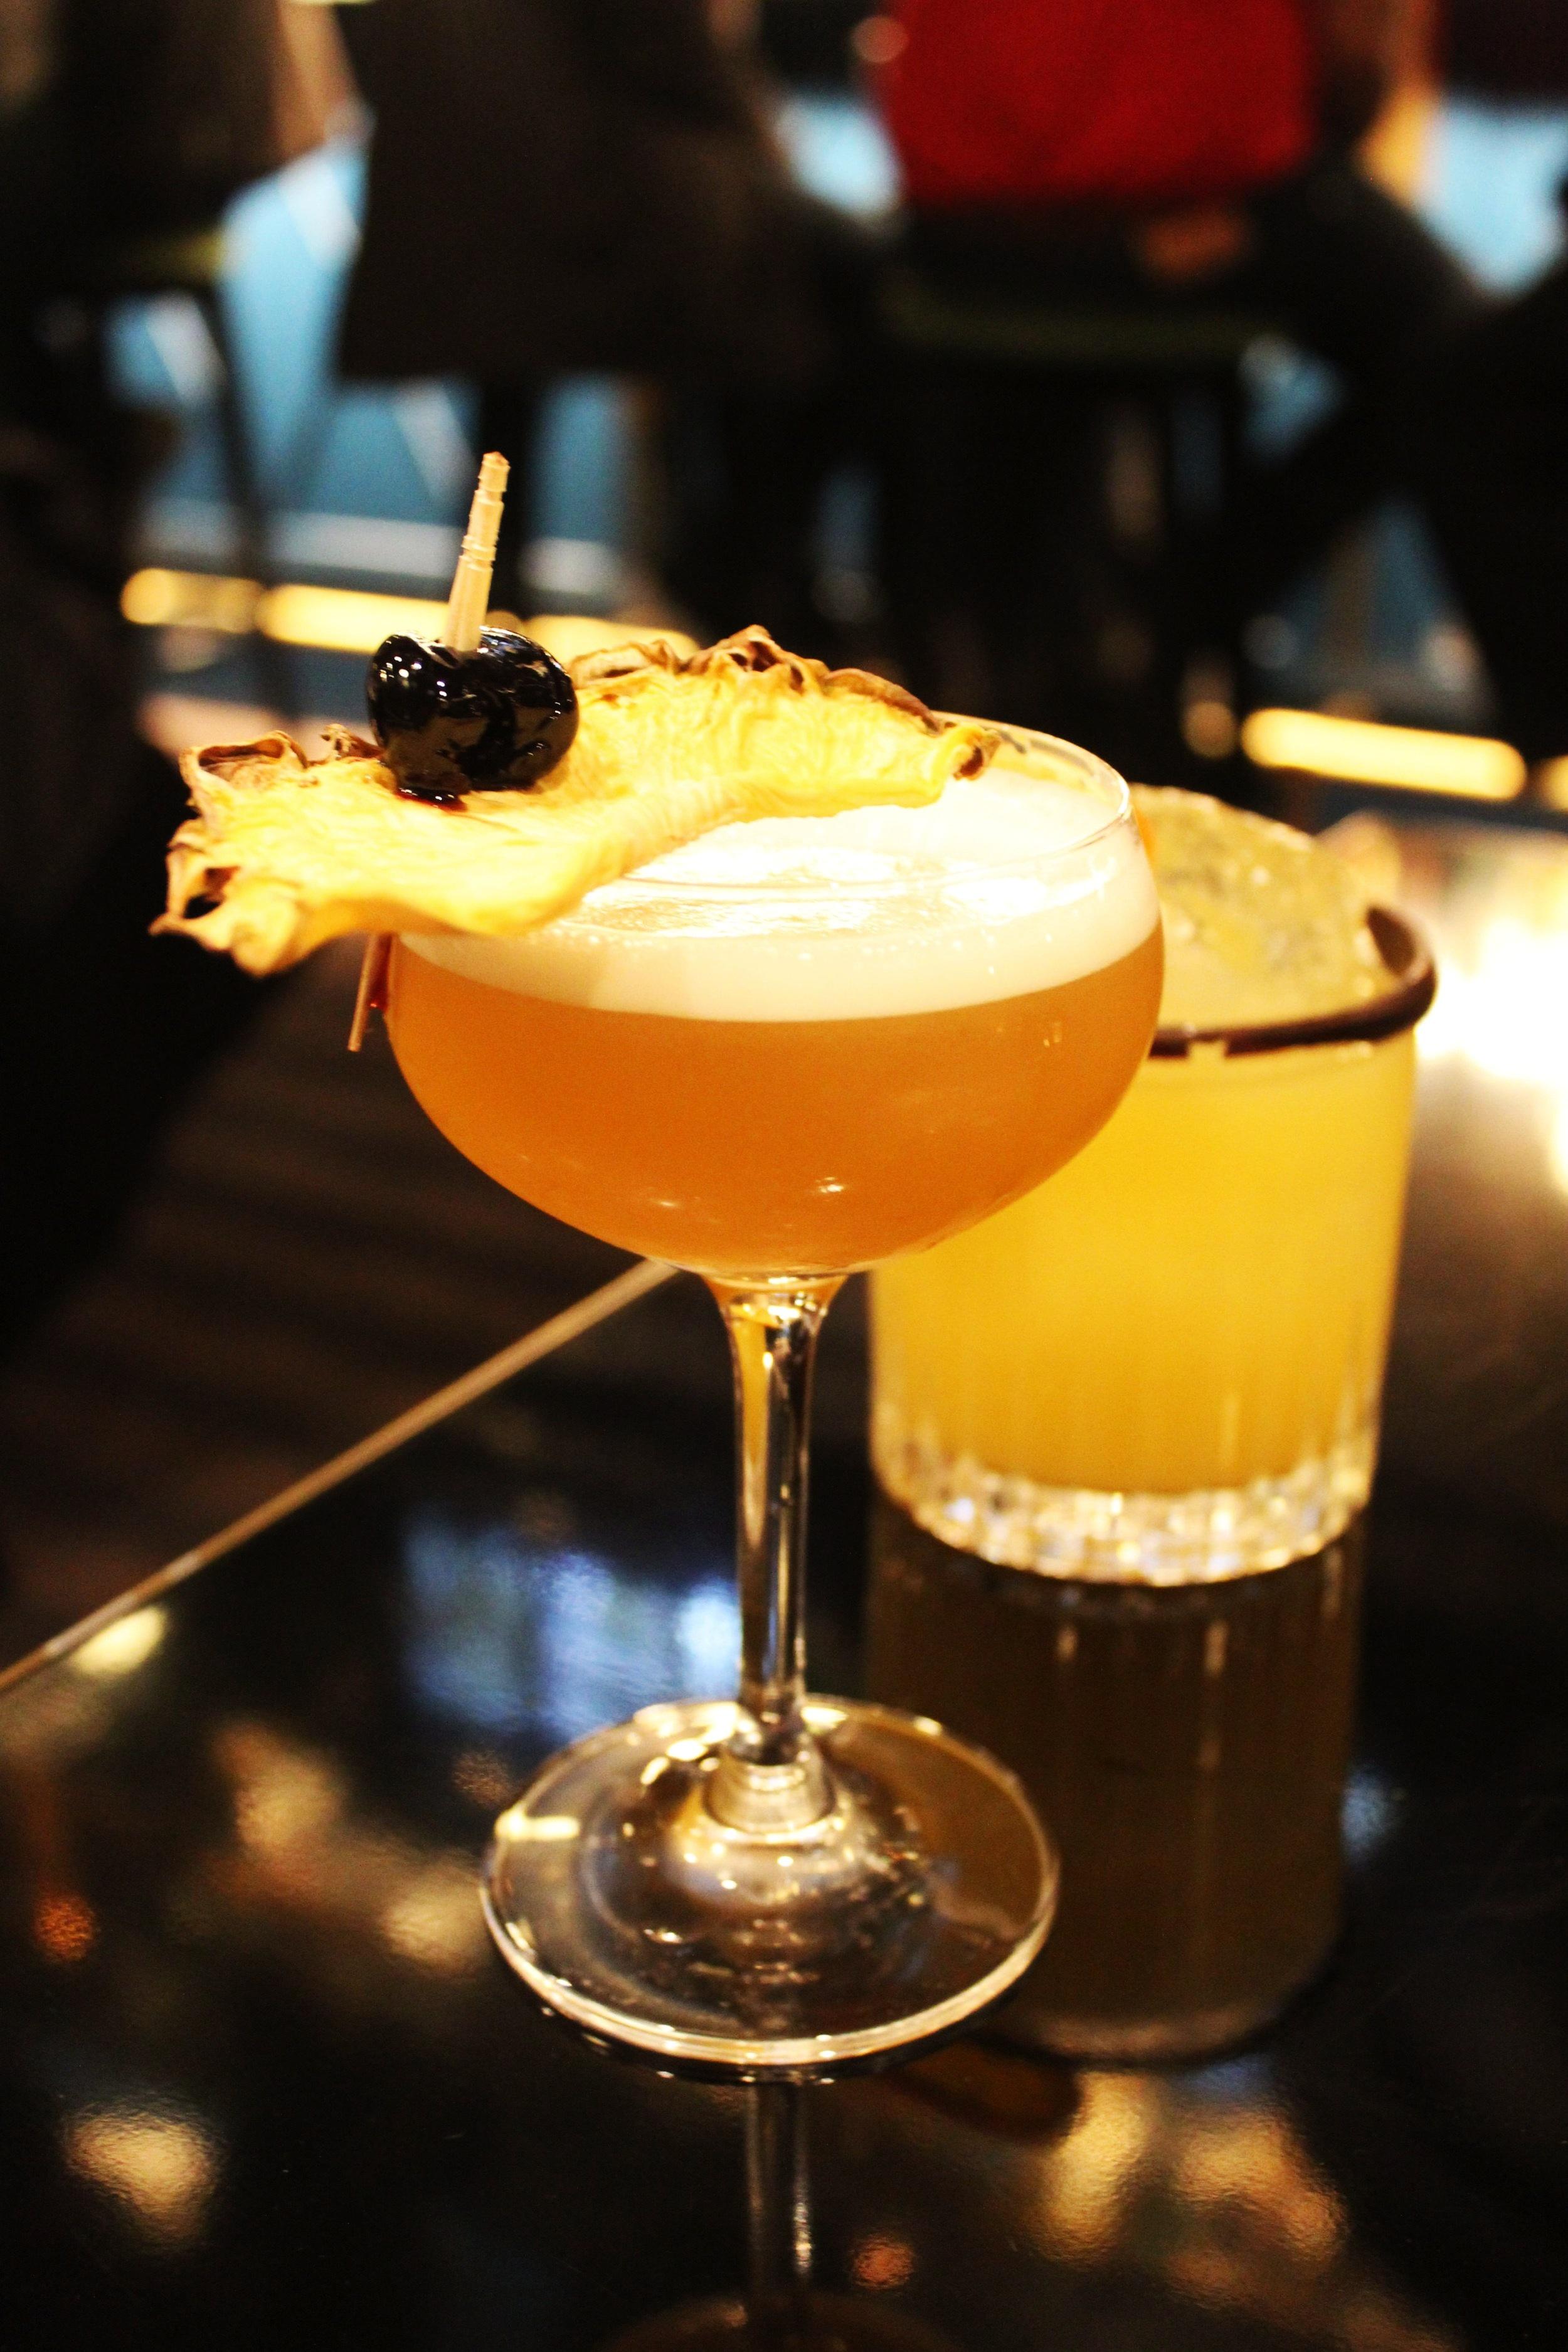 Ritorno serve a range of fabulous classic and signature cocktails